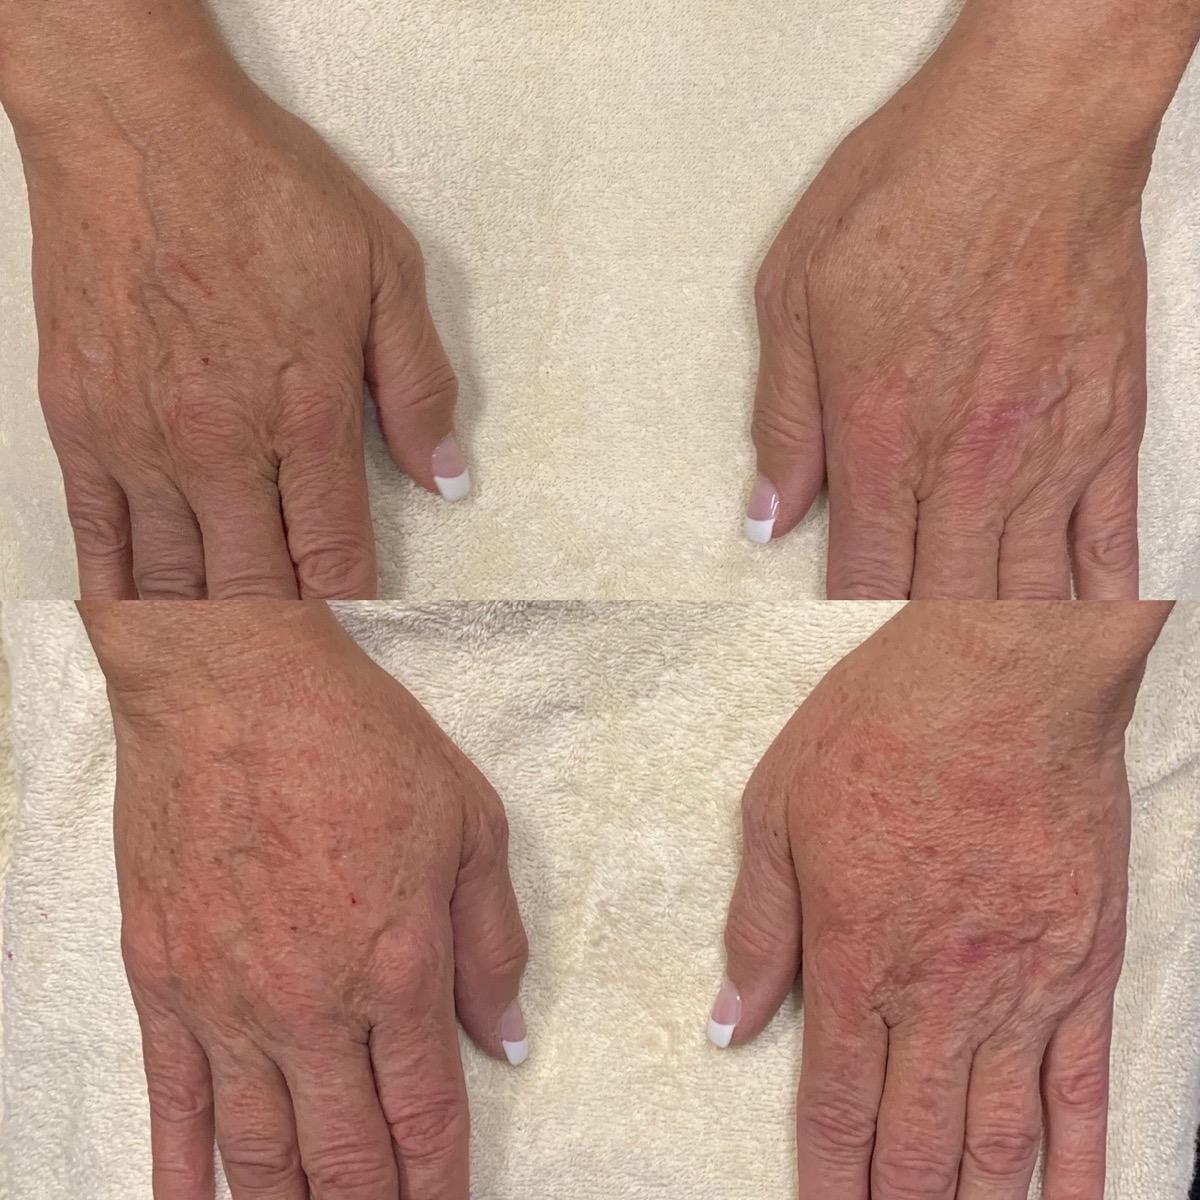 Hand Gallery - Patient 3199415 - Image 1